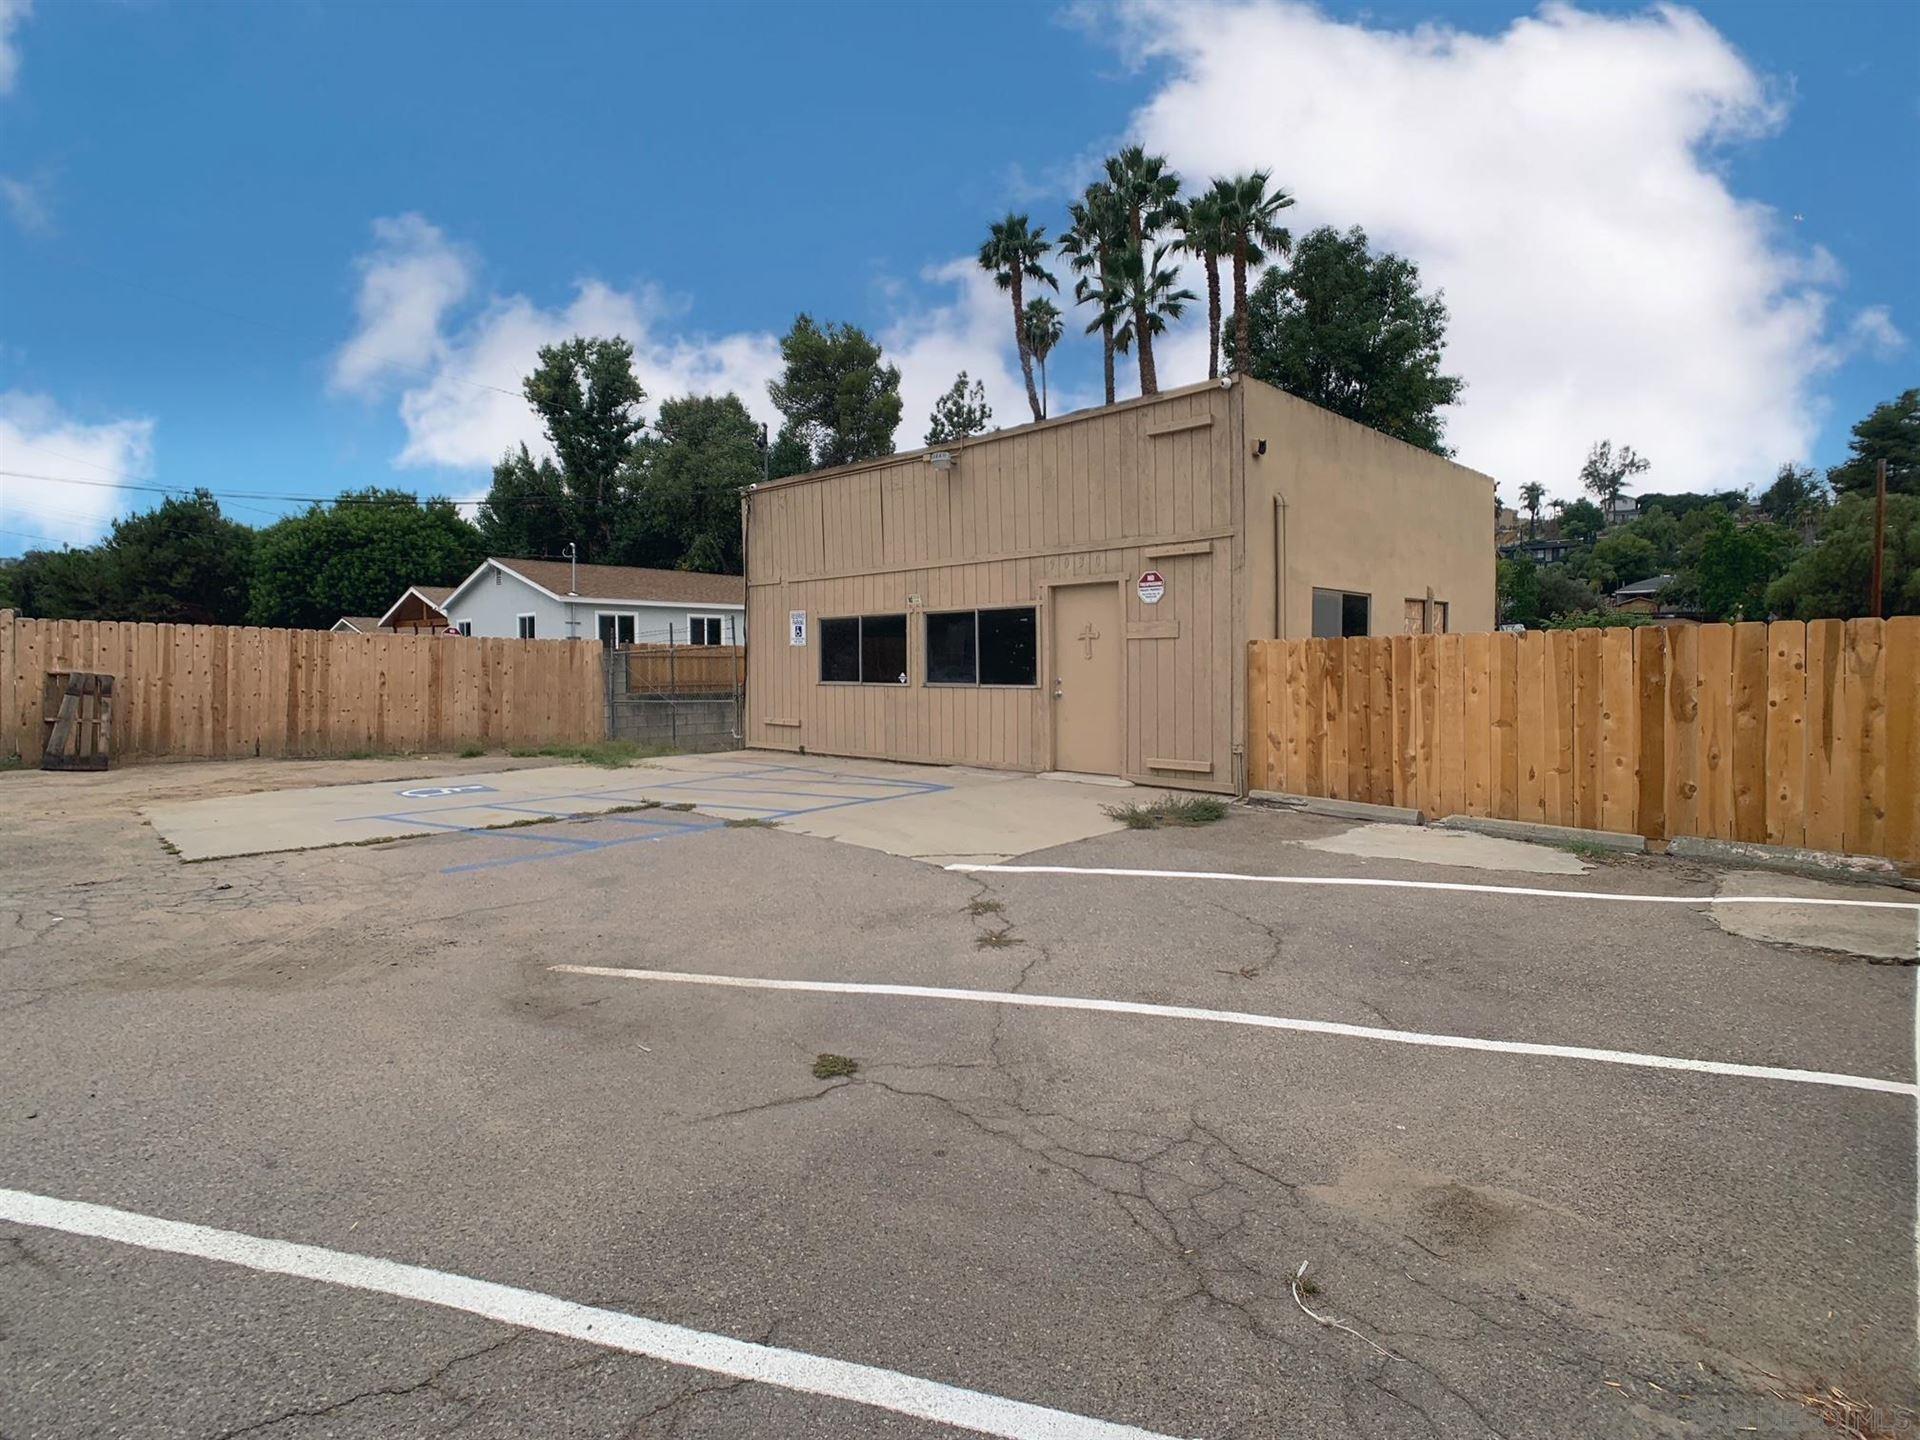 Photo of 9030 Wintergardens, Lakeside, CA 92040 (MLS # 210025515)